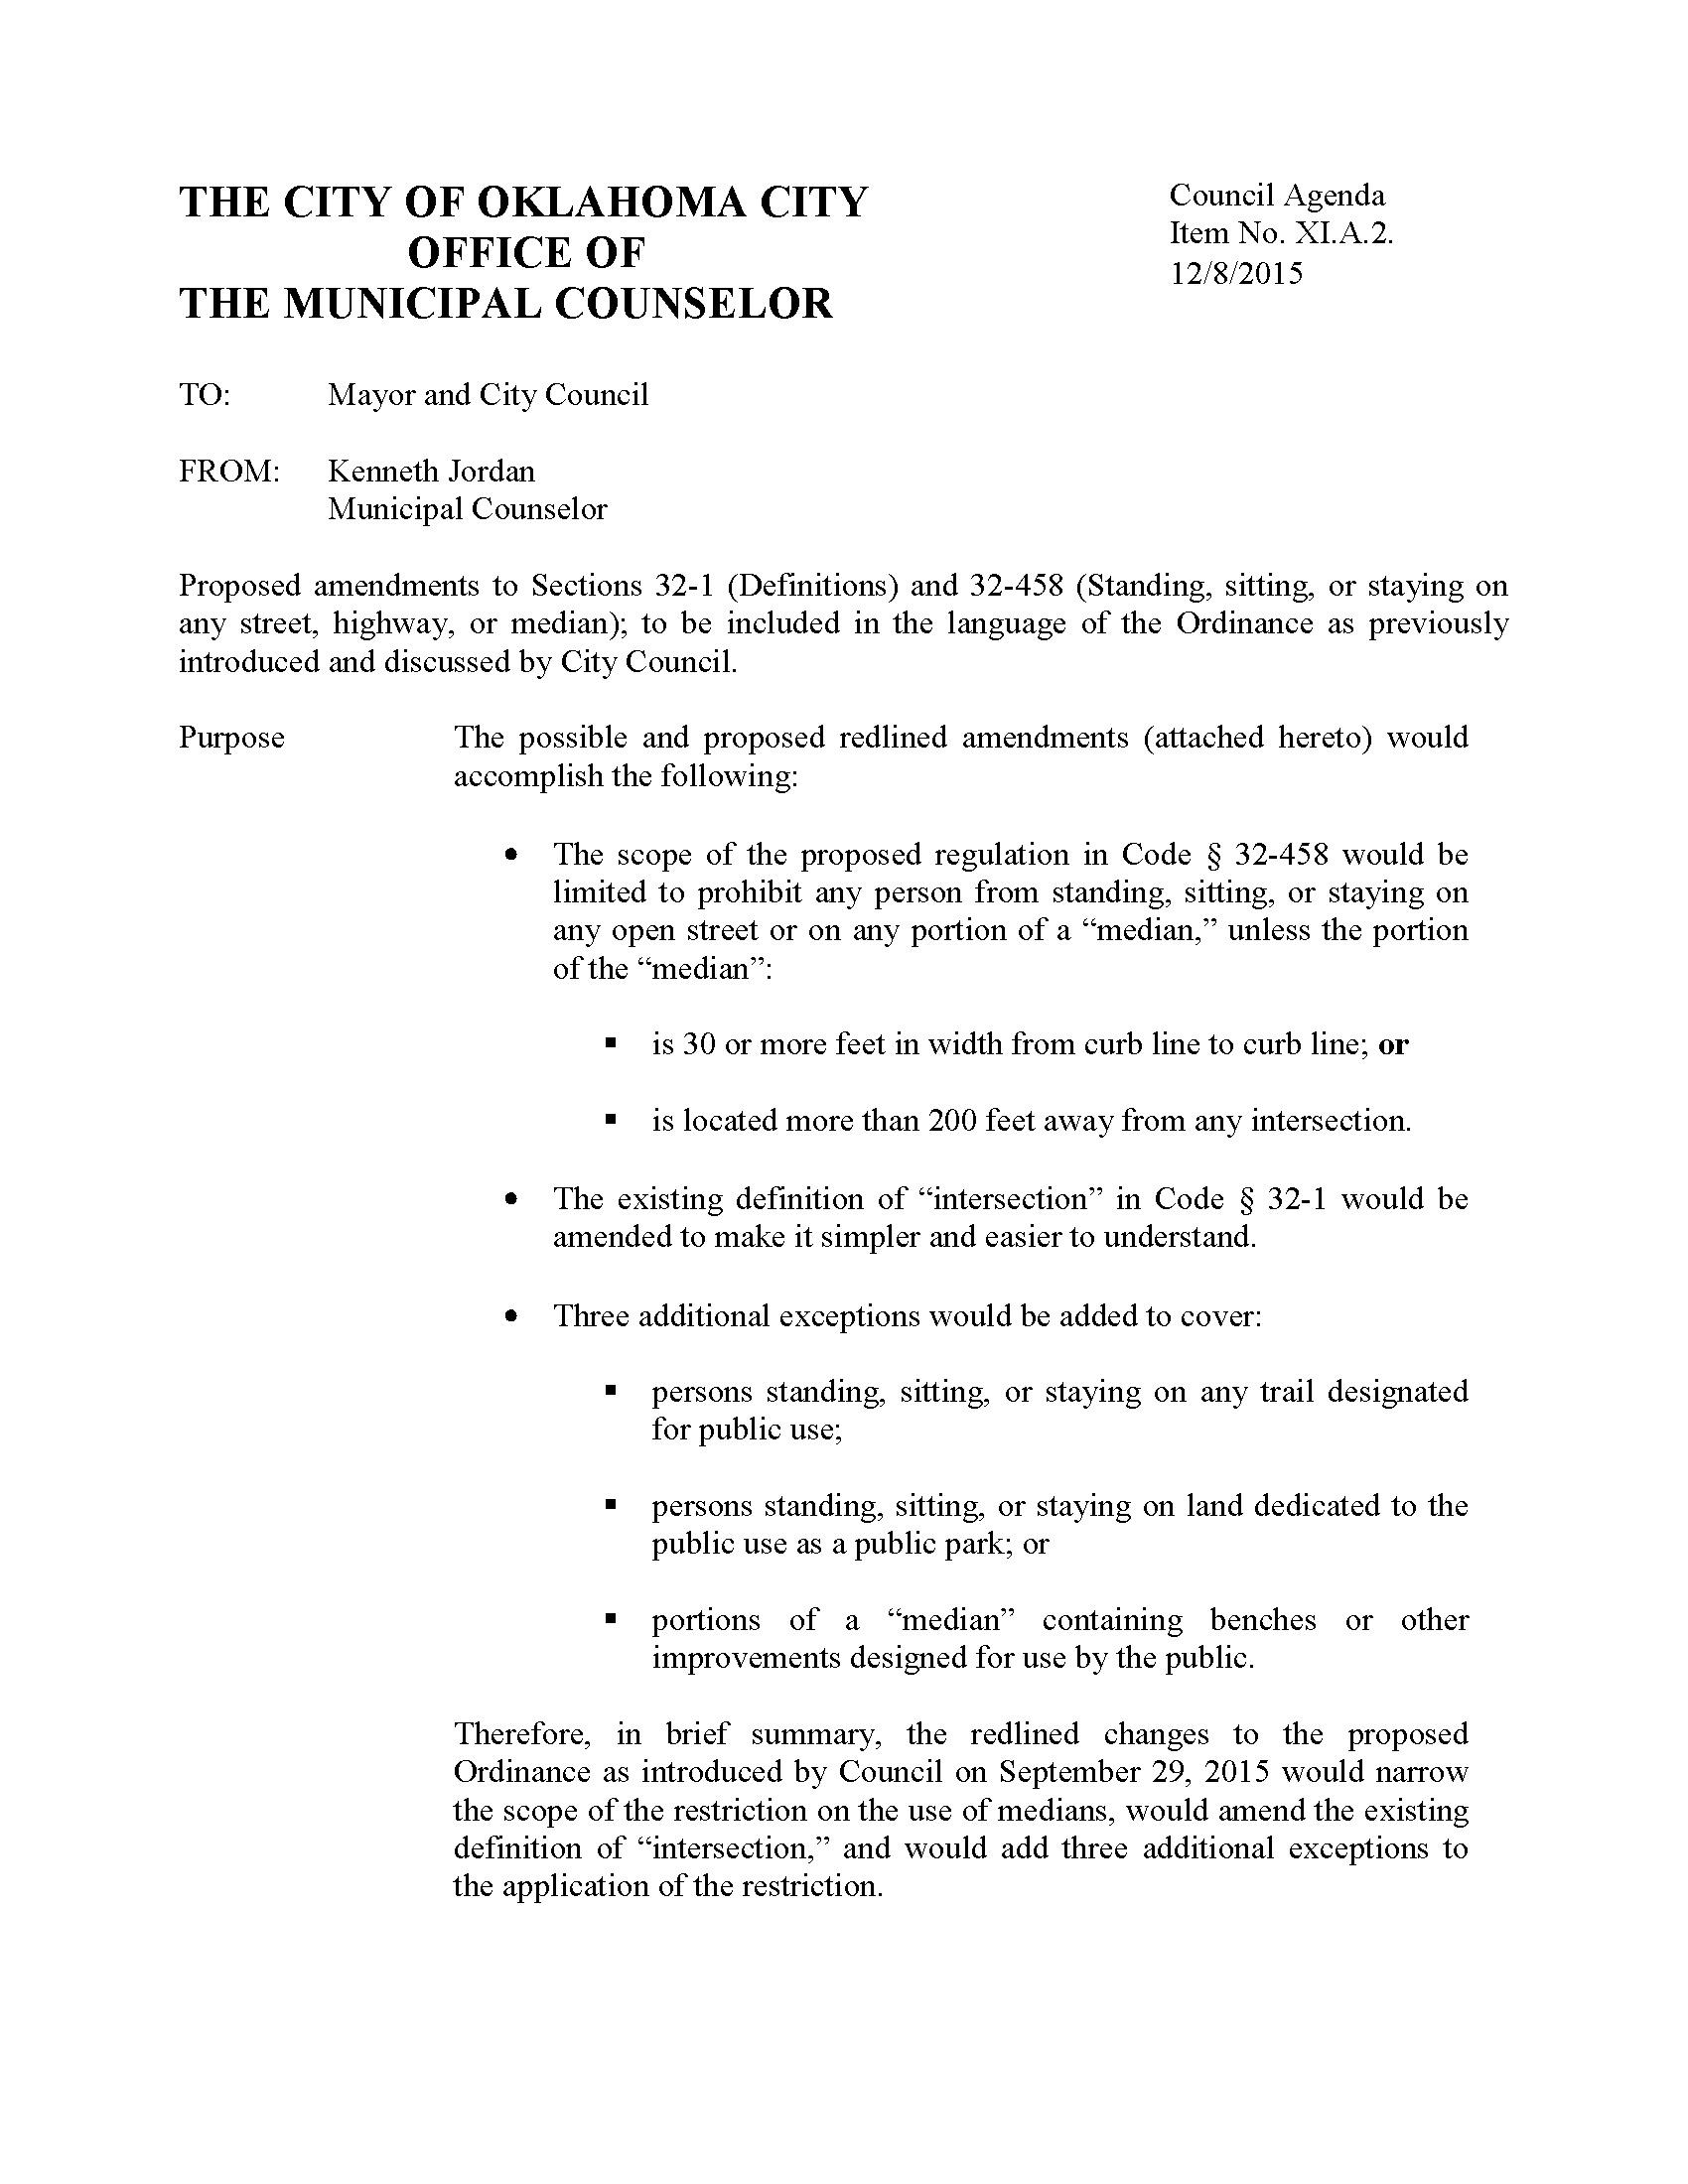 Median_definition_Page_1.jpg